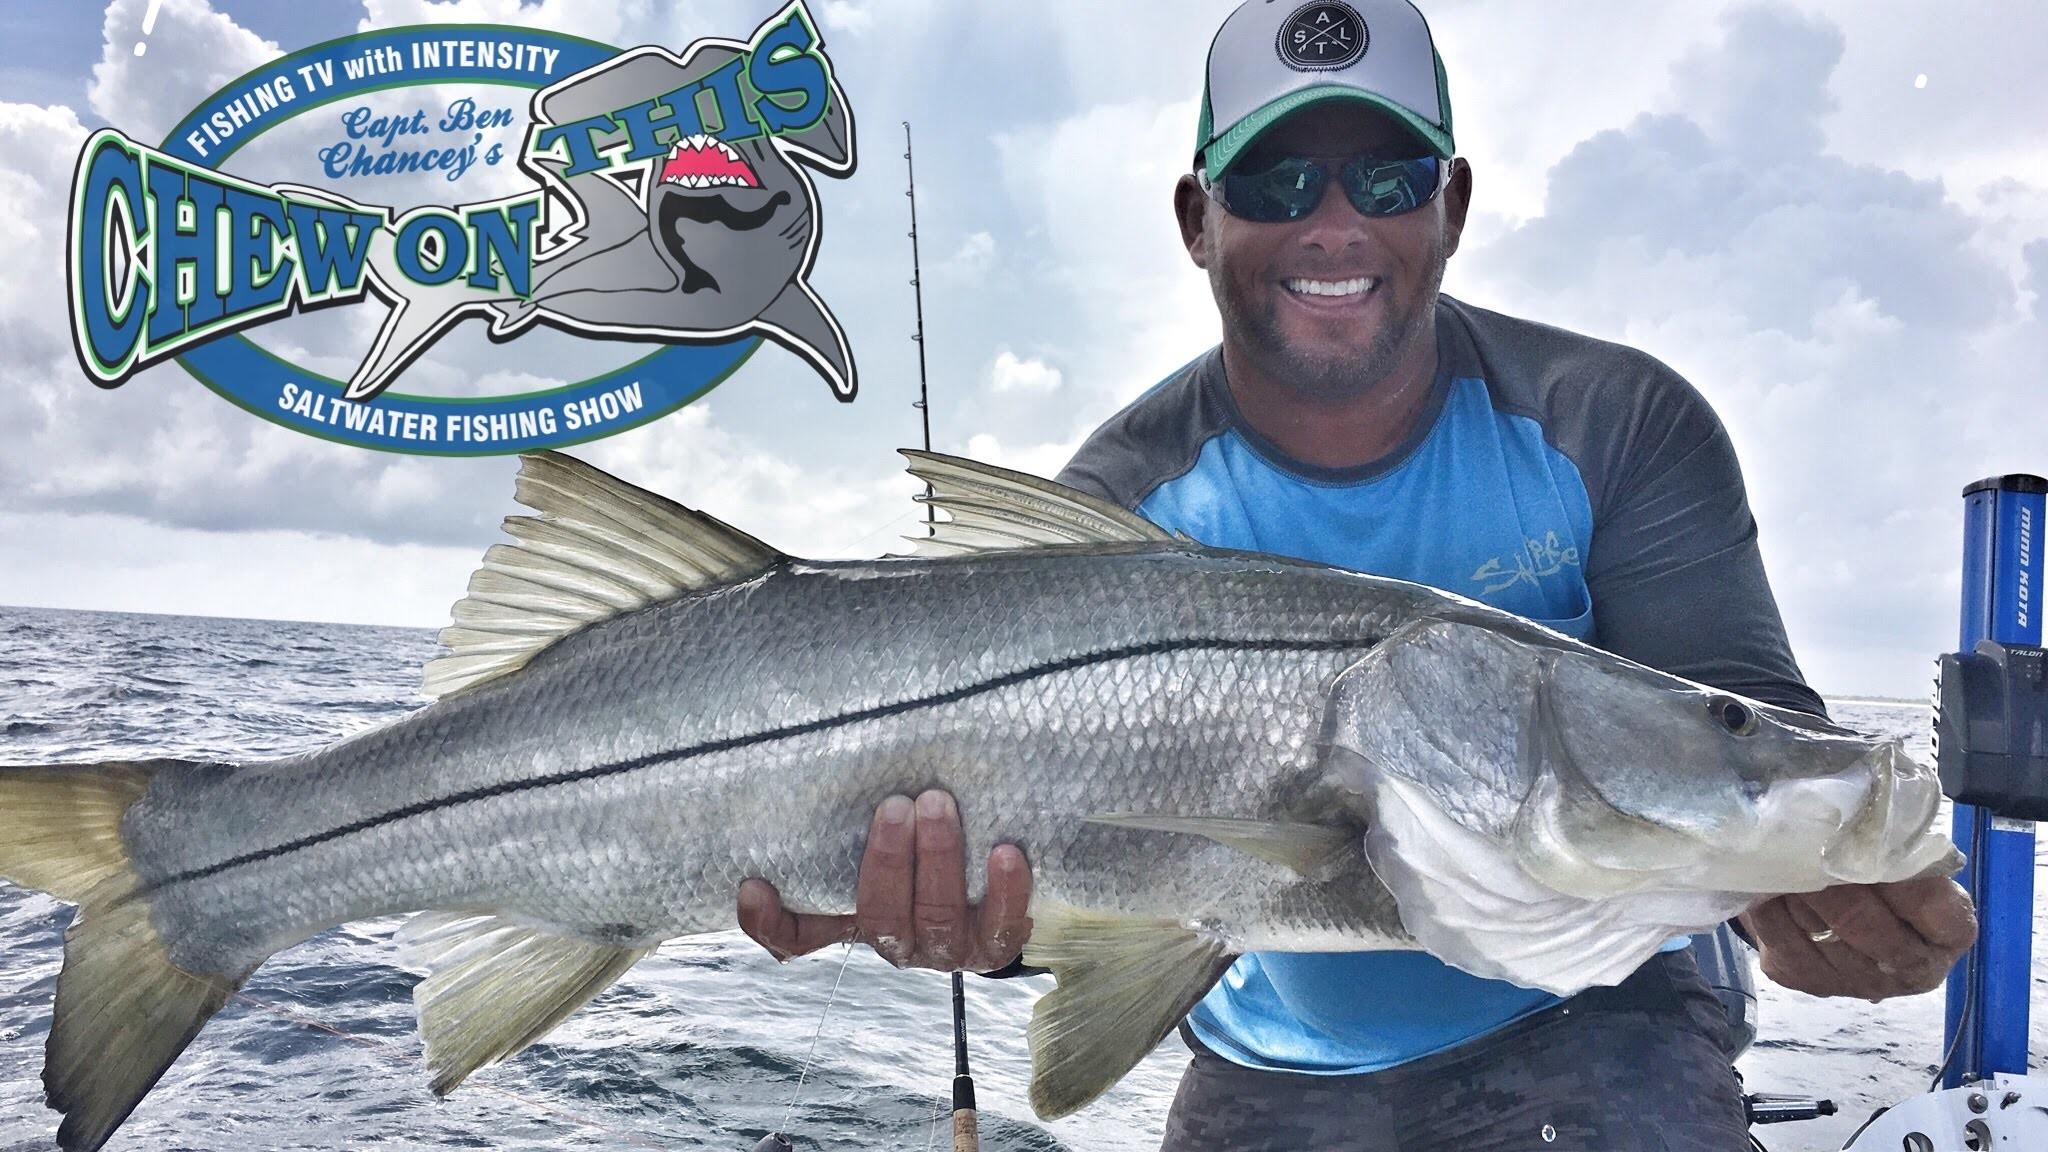 Best Snook Fishing Video – Saltwater Fishing Most Popular – Amazing Florida  Fishing – Catching Snook – YouTube